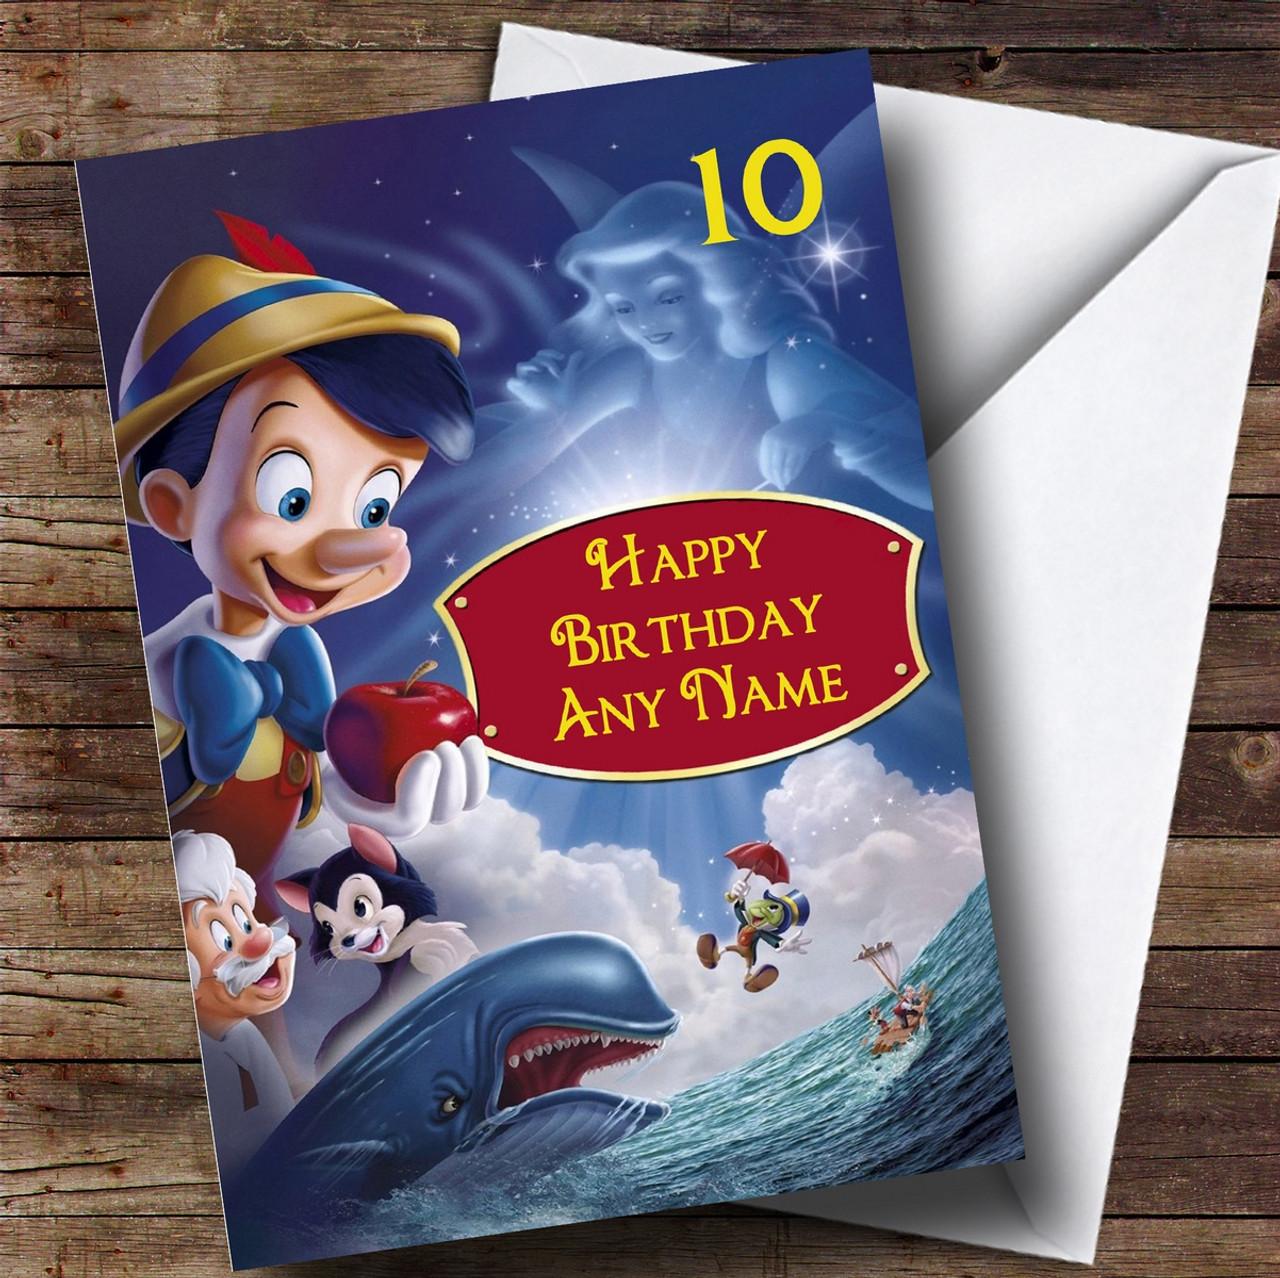 Personalised Disney Pinocchio Childrens Birthday Card